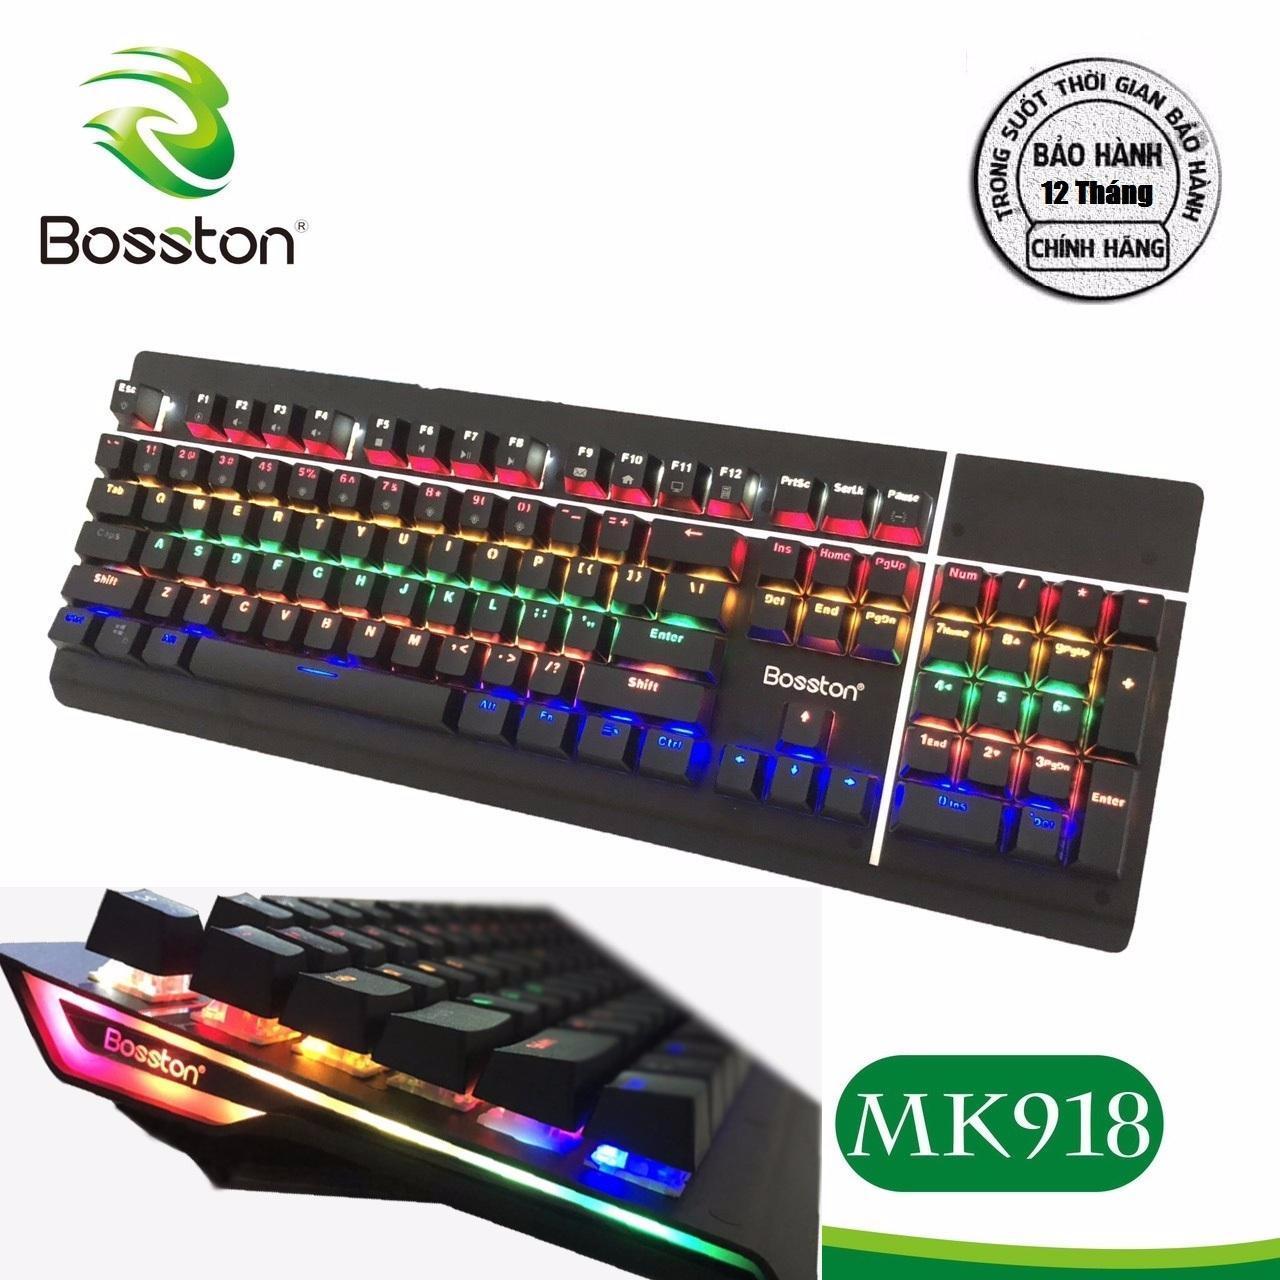 ban-phim-co-bosston-mk918-full-led-blue-switch-new-chinh-hang